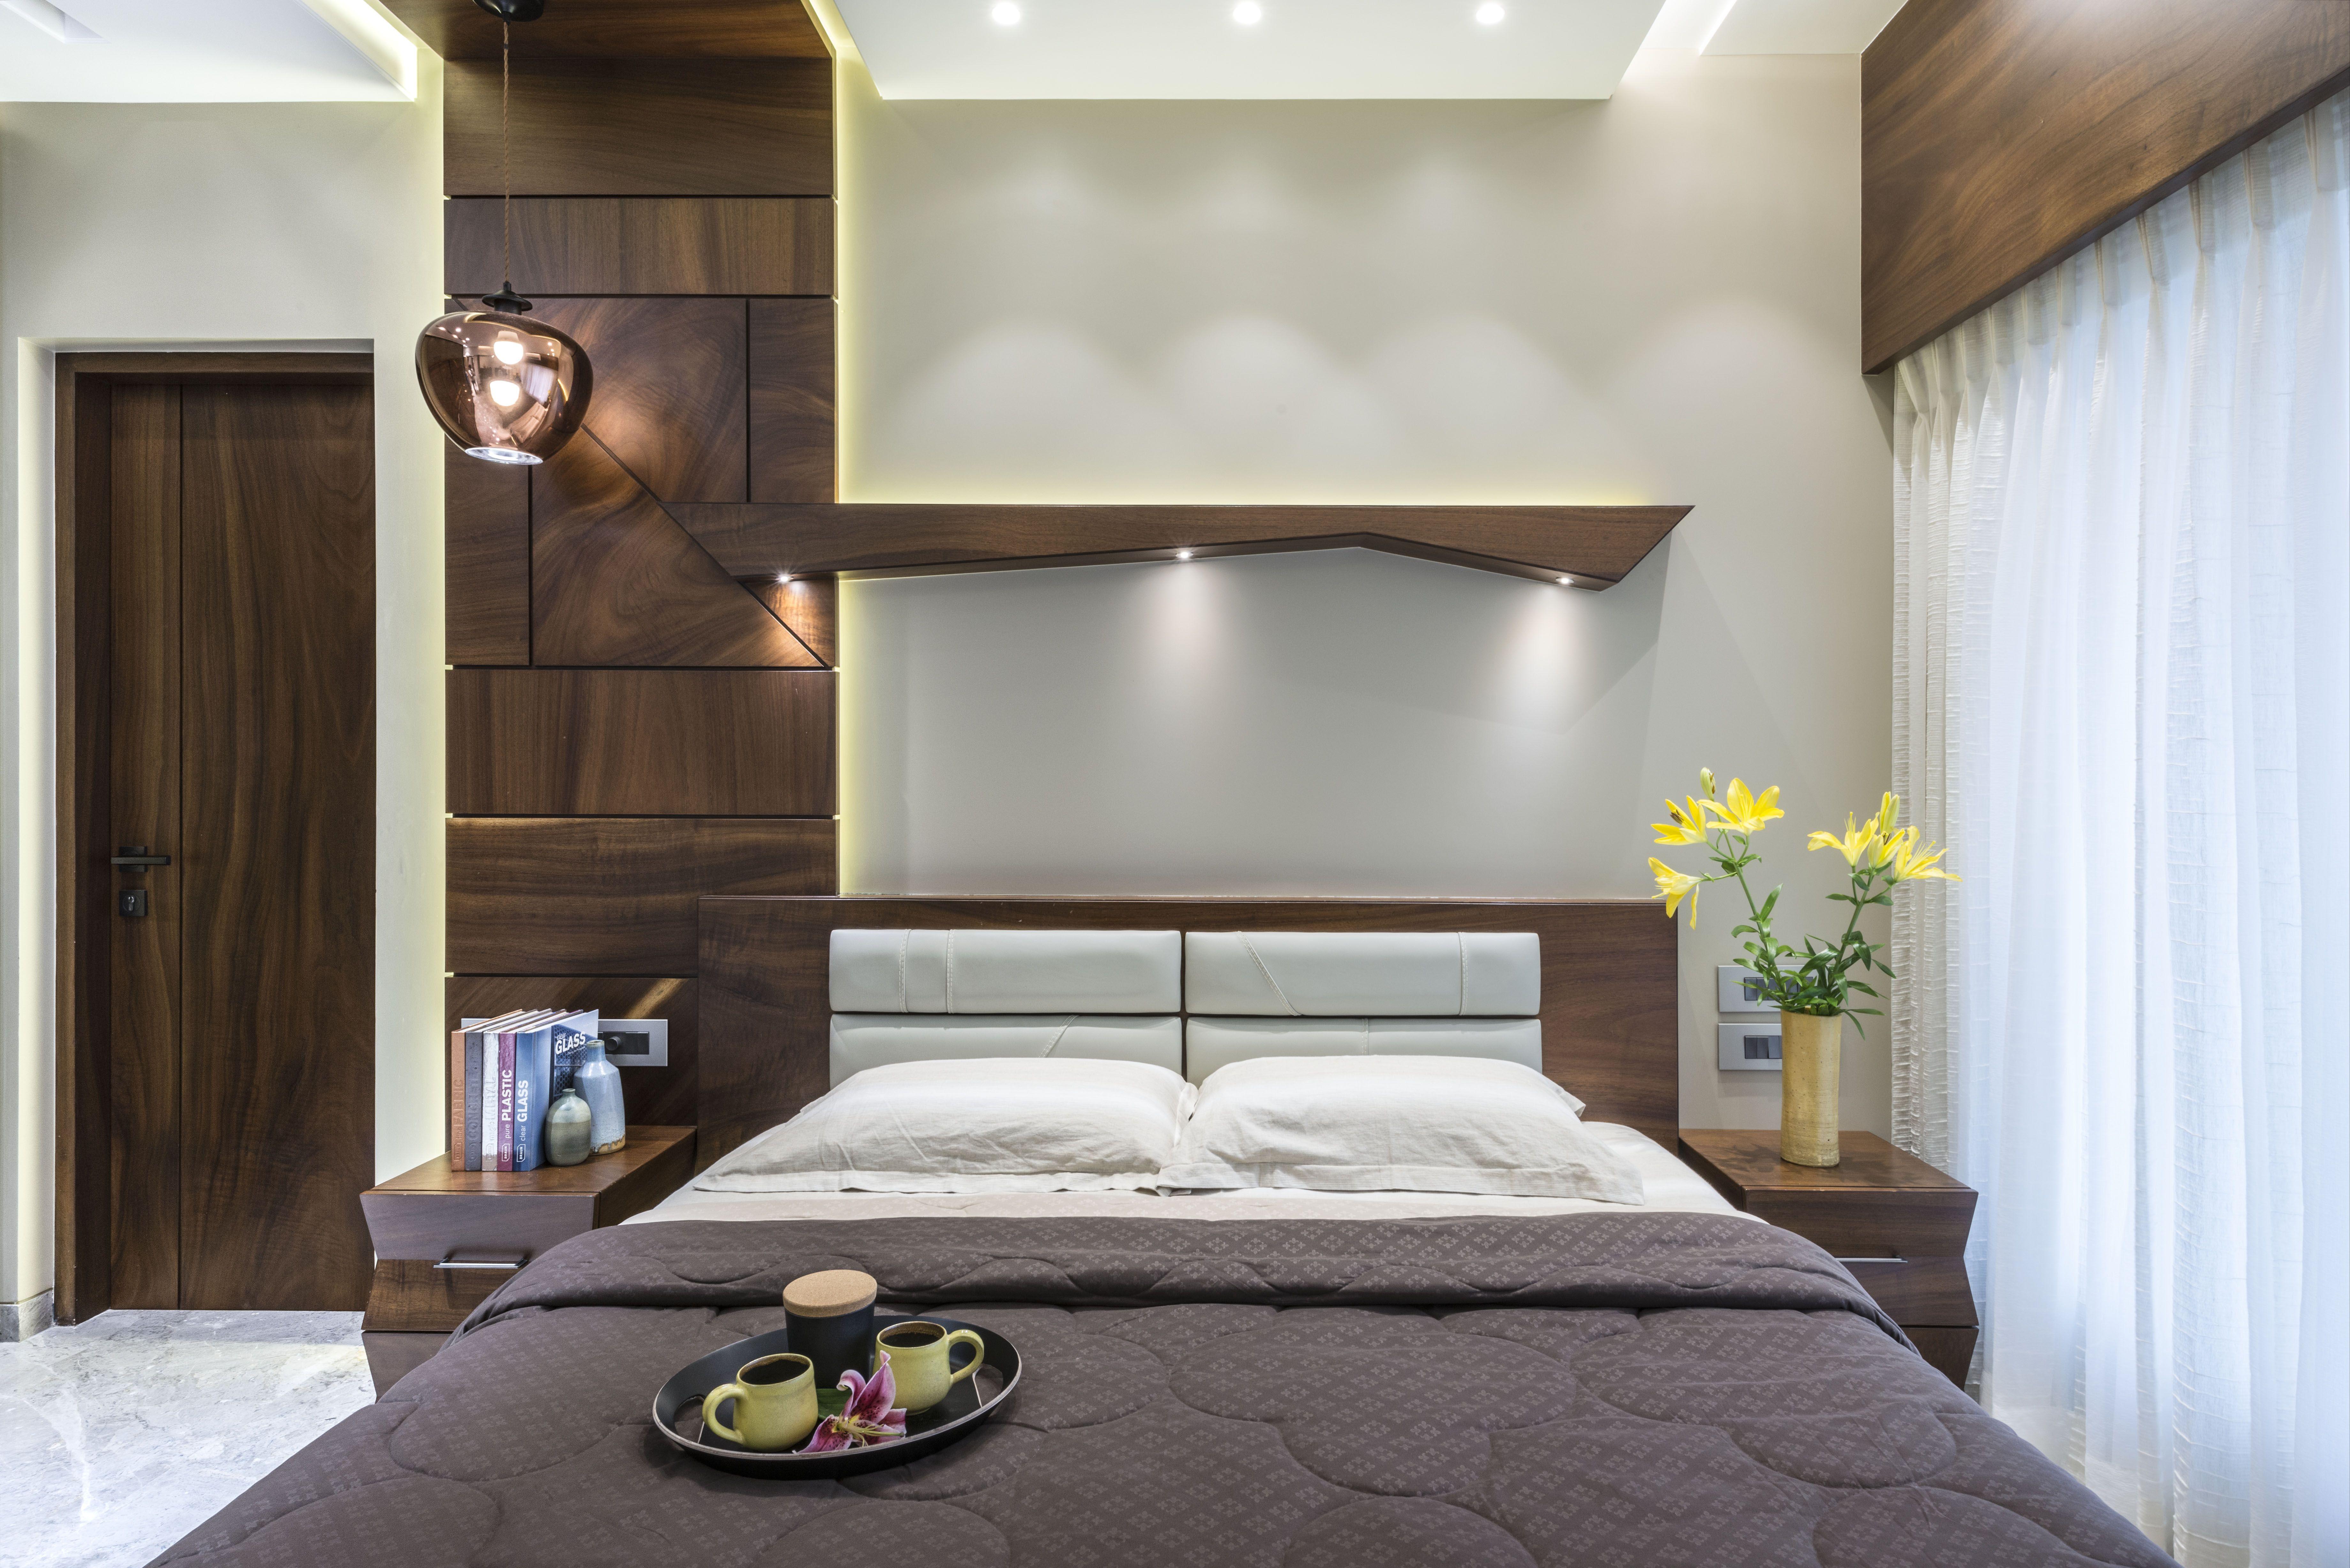 Mumbaibeddesign modern bedroom design bed tv beds panel wardrobe also in rh pinterest